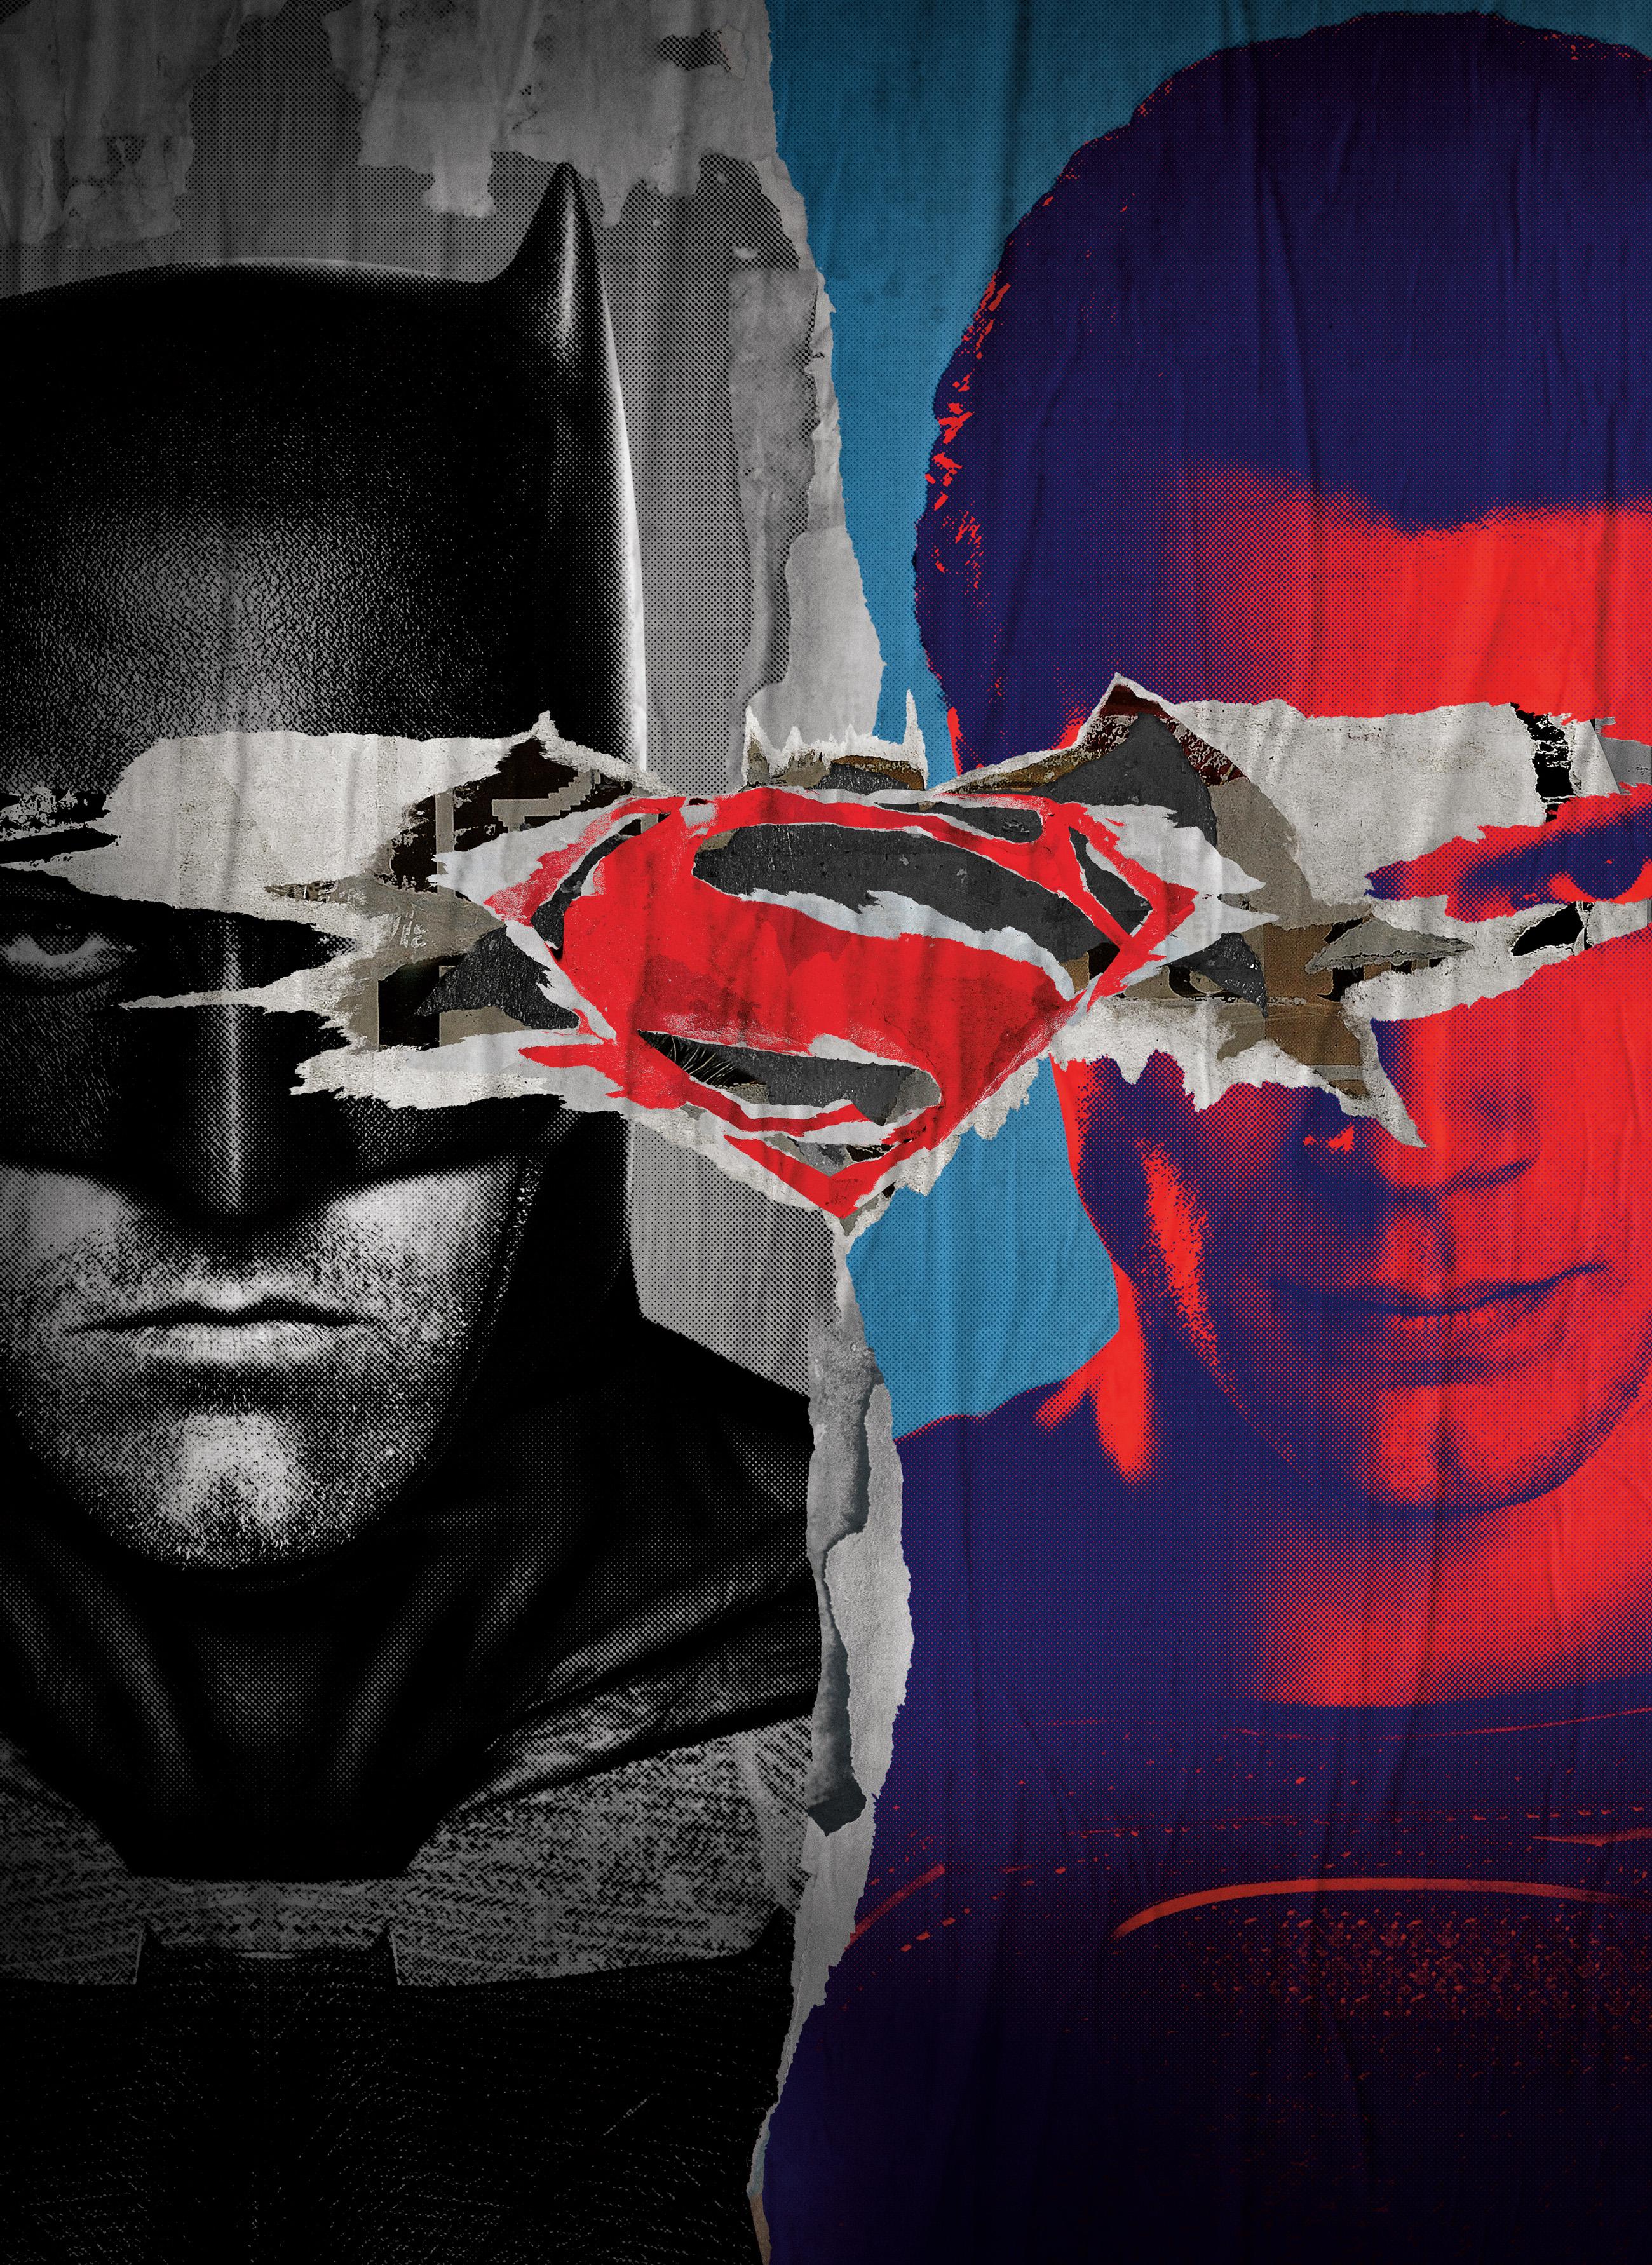 Wallpaper Batman V Superman Dawn Of Justice Movie Poster